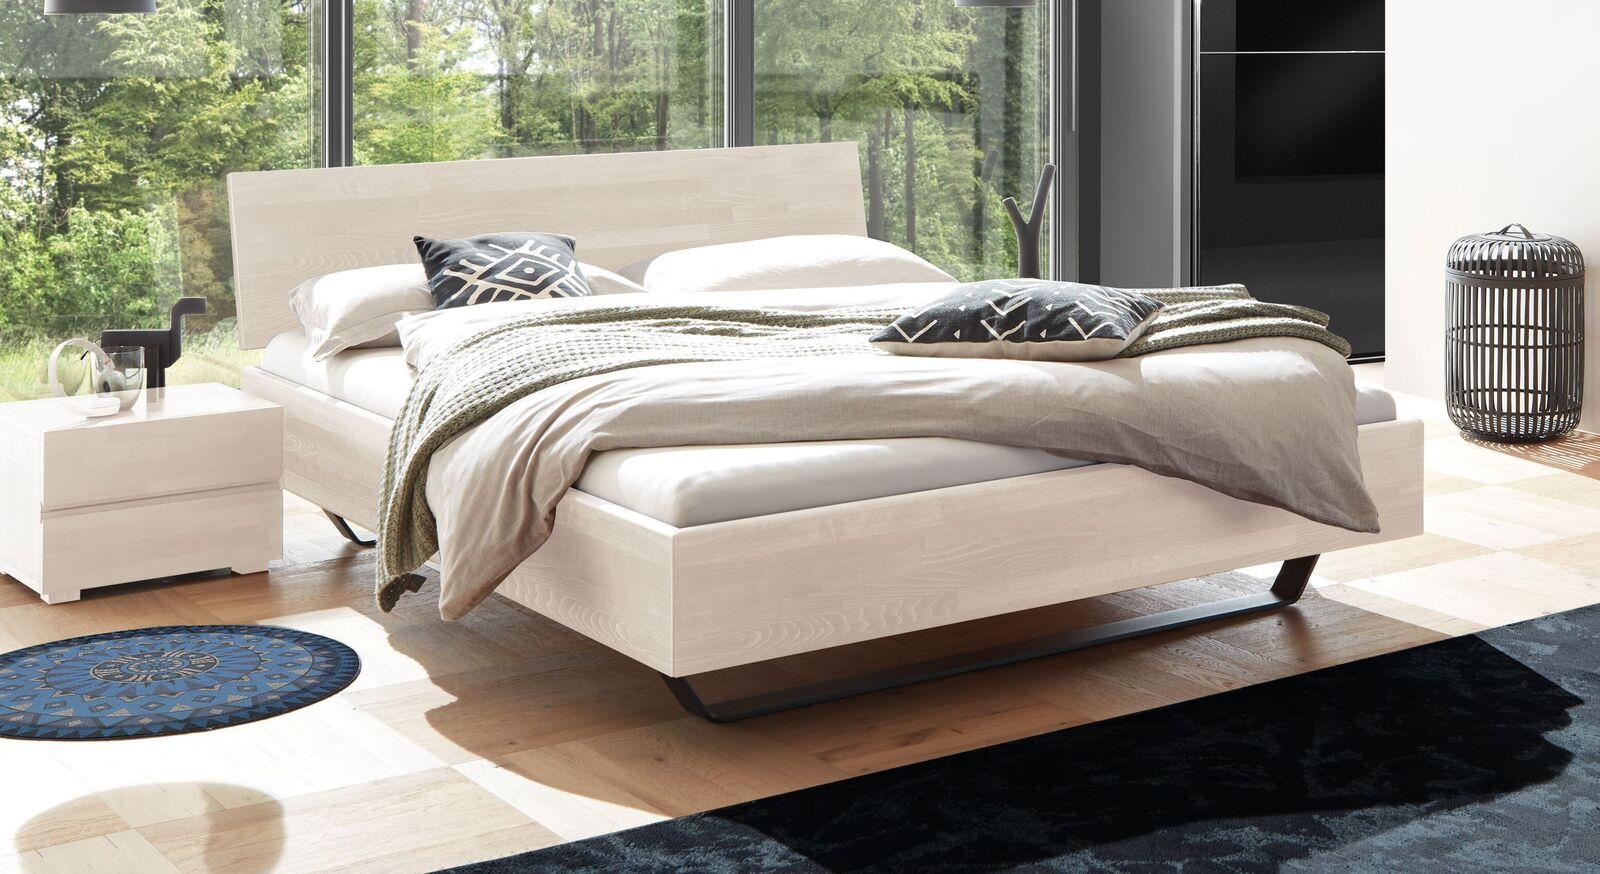 Bett Honoka aus weißem Buchenholz